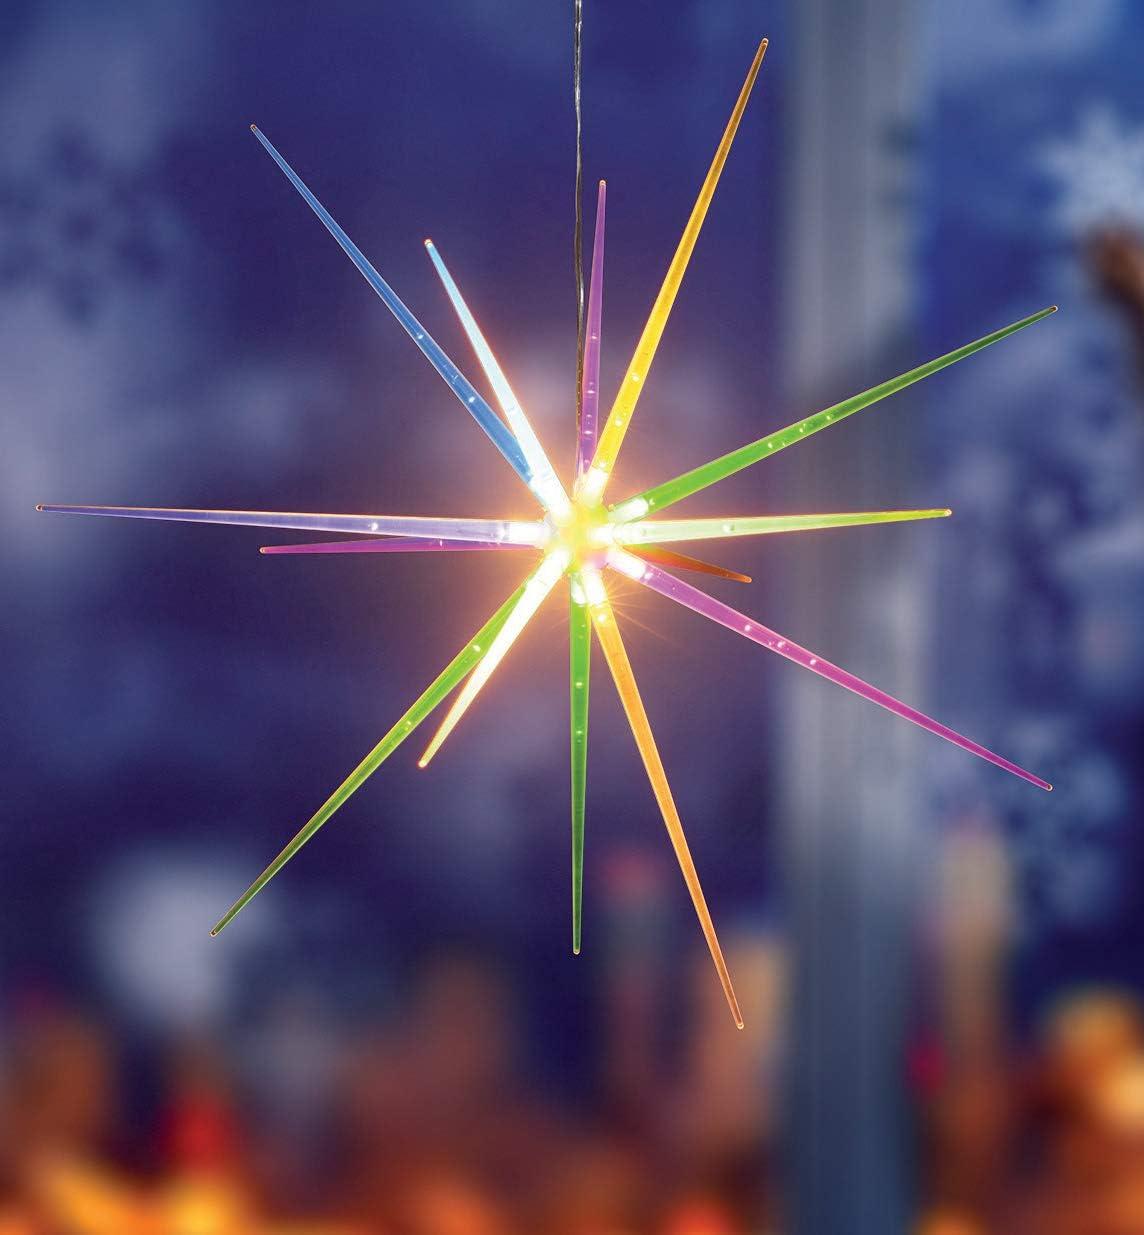 3 LED Bodenleuchten Star Sterne Timer Außen Innen Multicolor Deko Beleuchtet